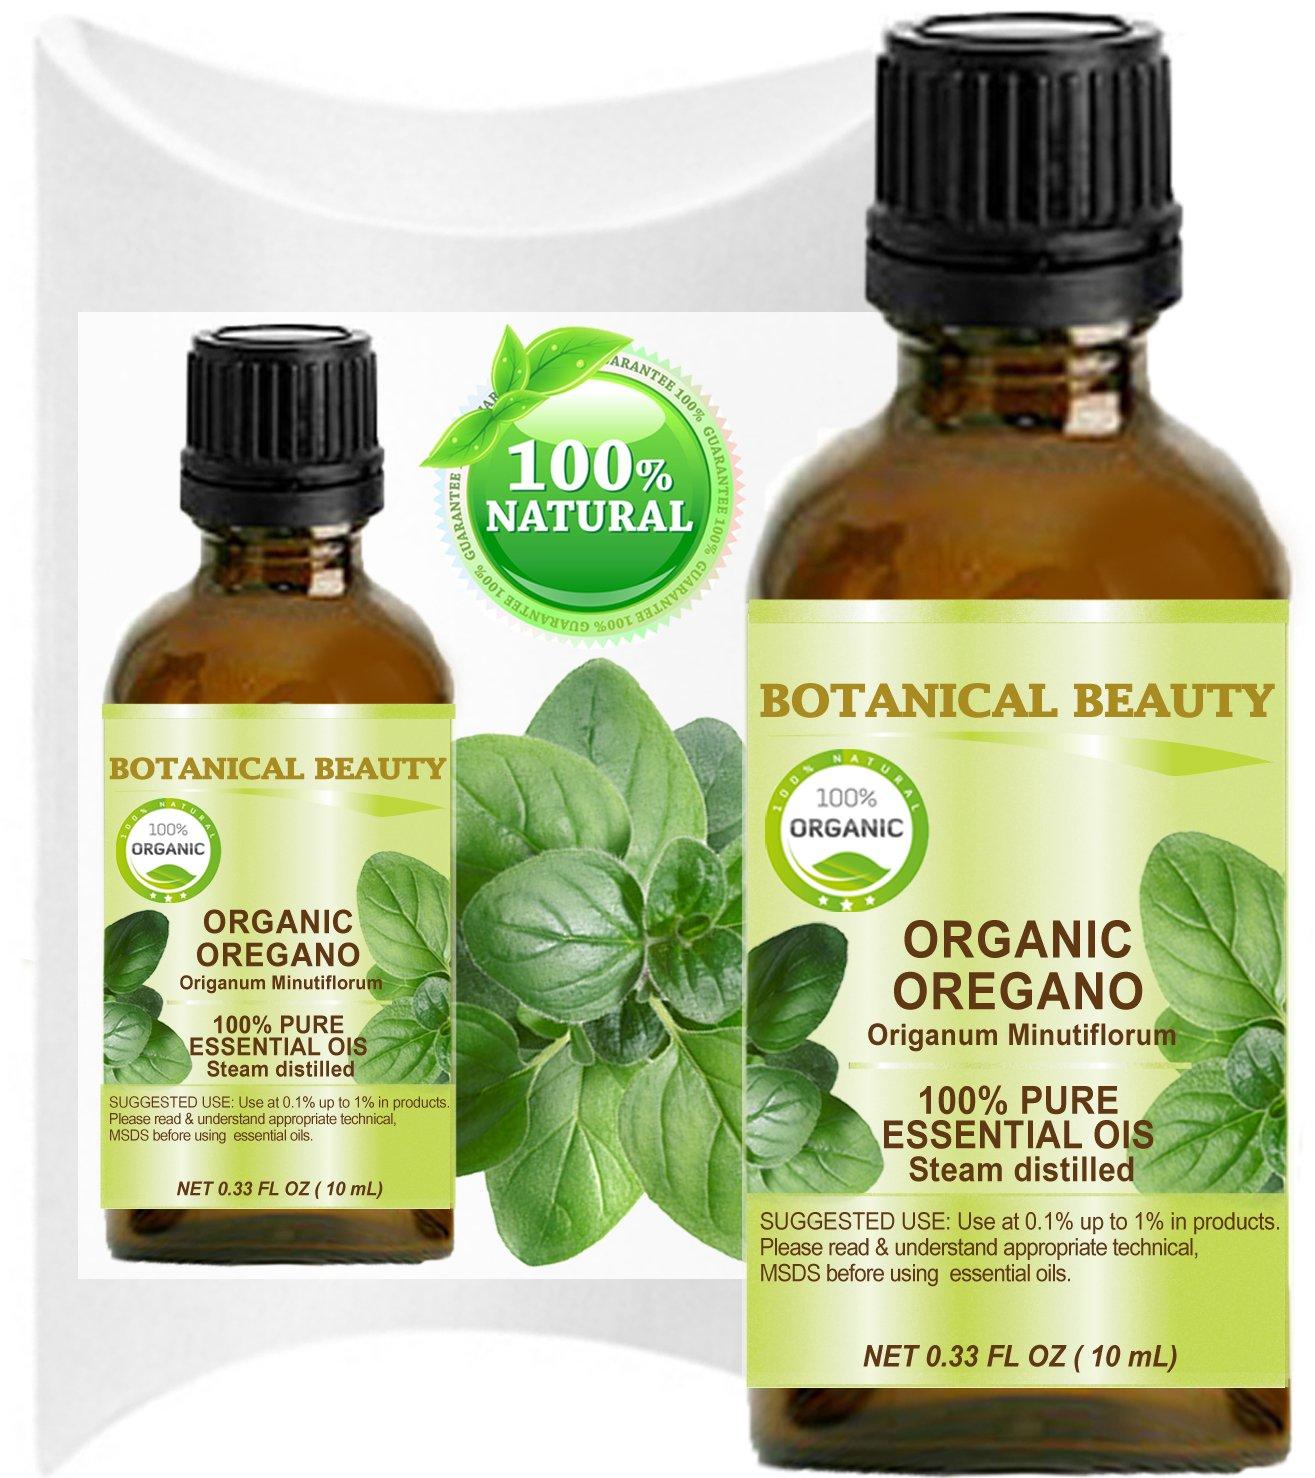 Botanical Beauty Organic OREGANO ESSENTIAL OIL WILD GROWTH. 100% Pure Therapeutic Grade Essential Oil Premium Quality, Undiluted. 0.33 Fl.oz.- 10 ml.